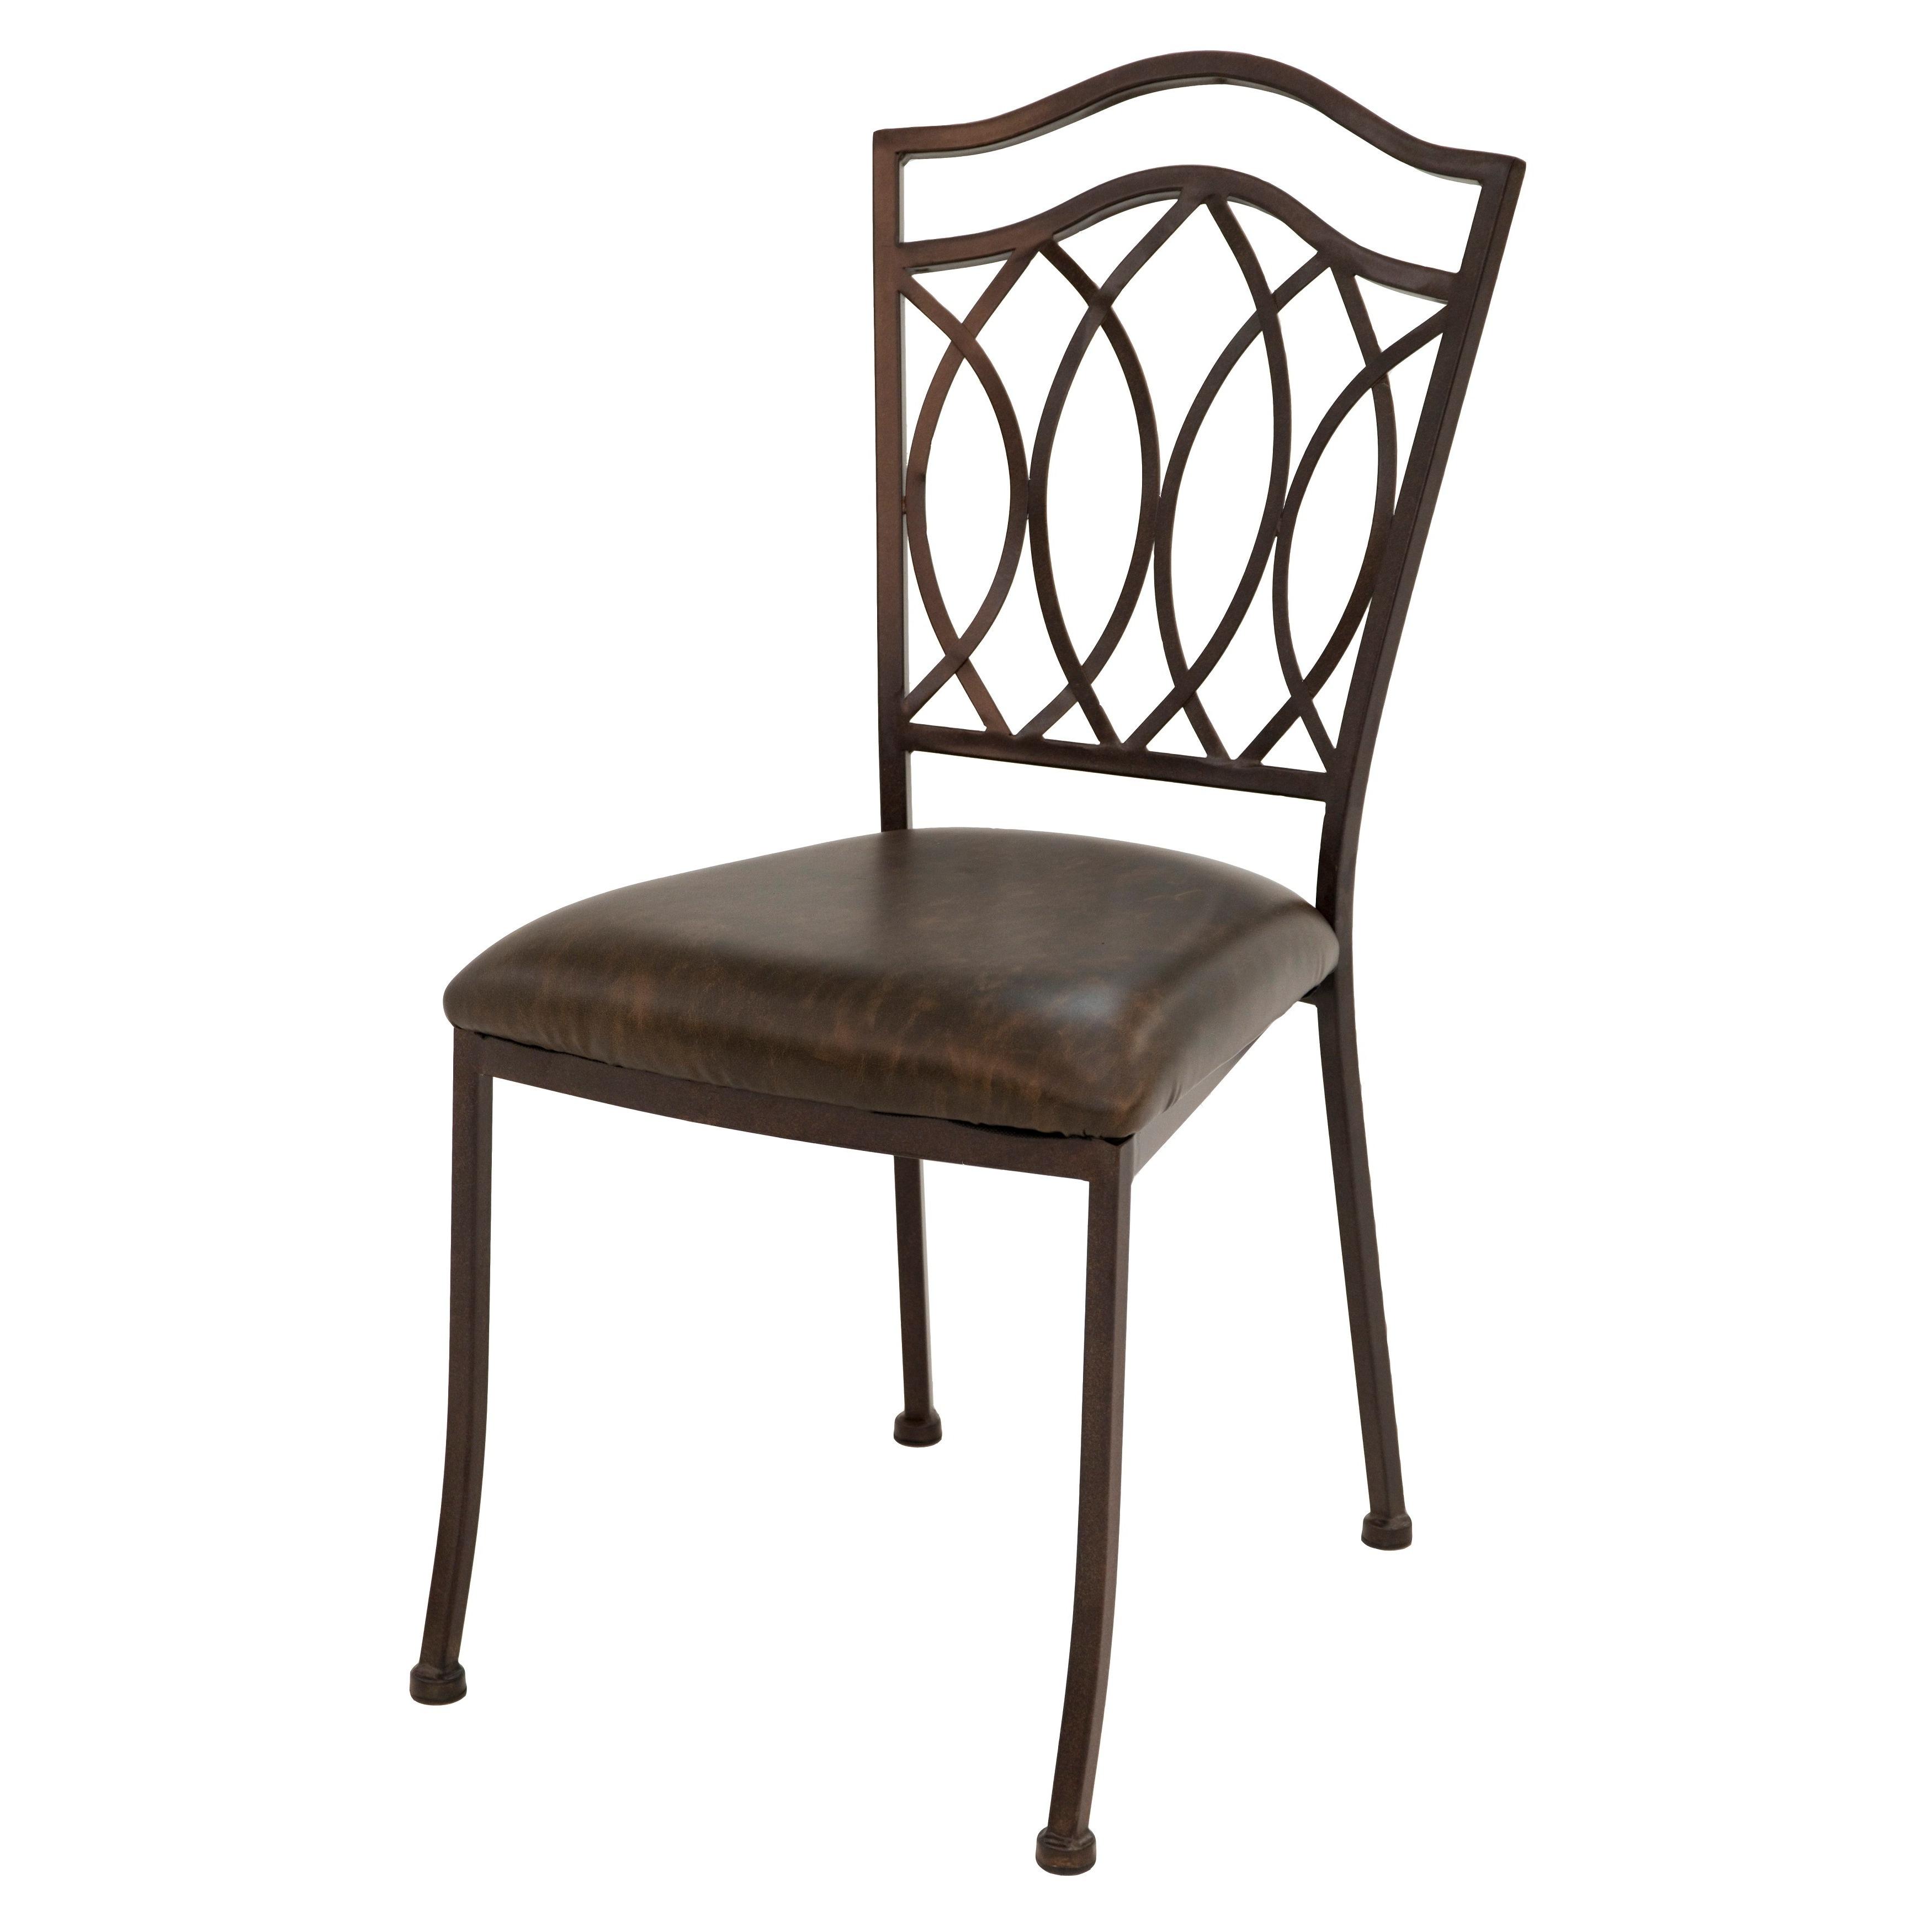 Westport Roletta Brown Upholstered Dining Chair (Westport...